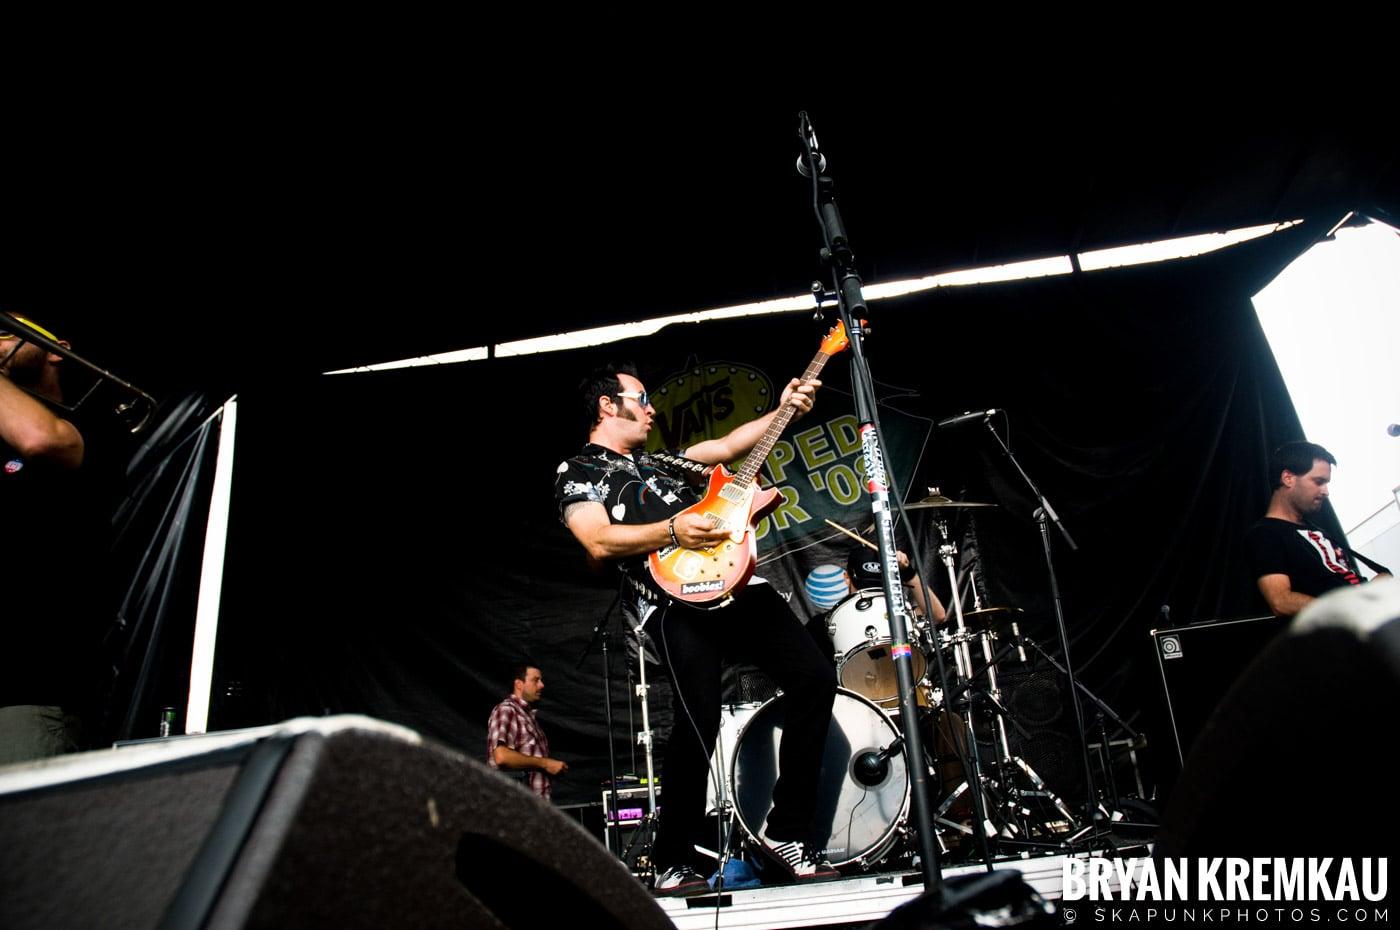 Reel Big Fish @ Warped Tour 08, Scranton PA - 7.27.08 (13)